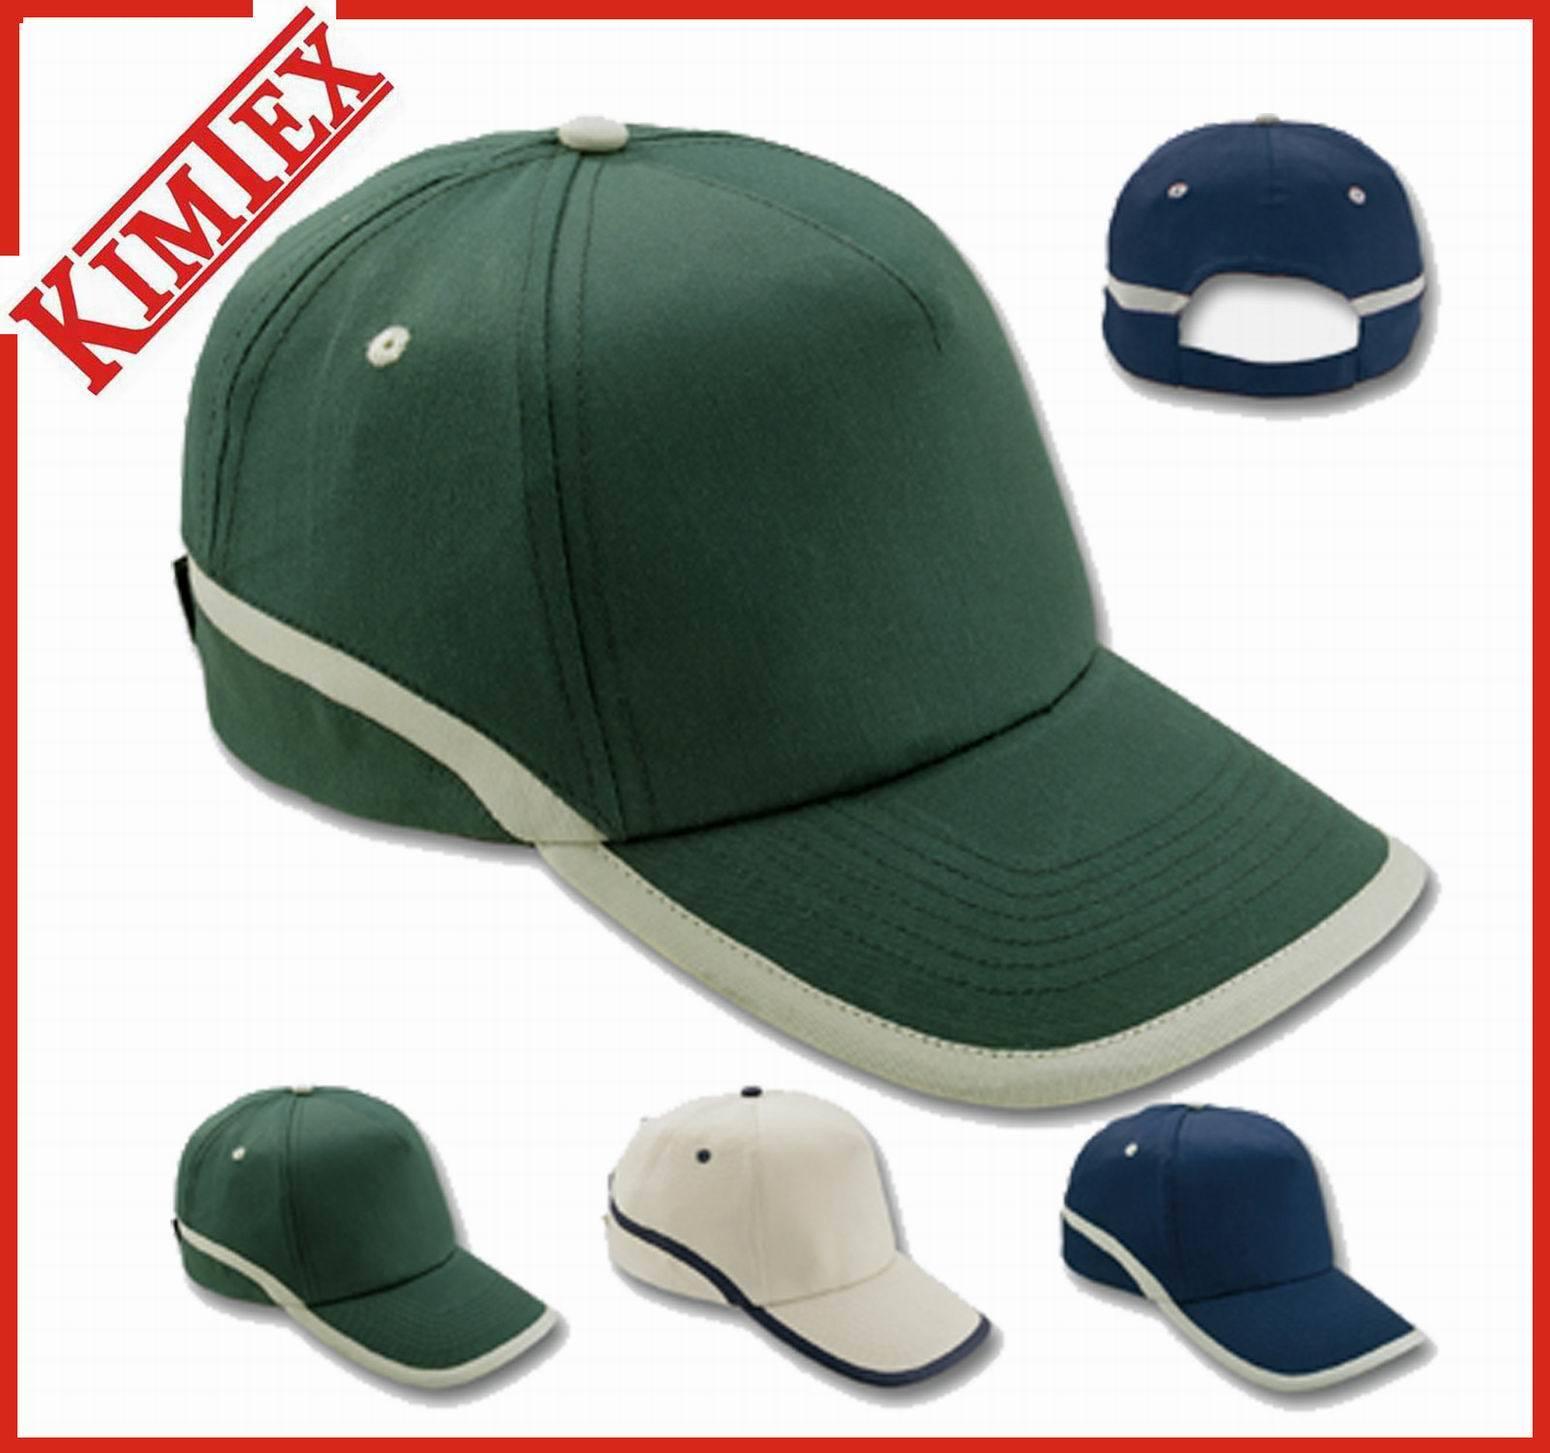 100% Cotton 5 Panel Sports Embroidery Baseball Cap